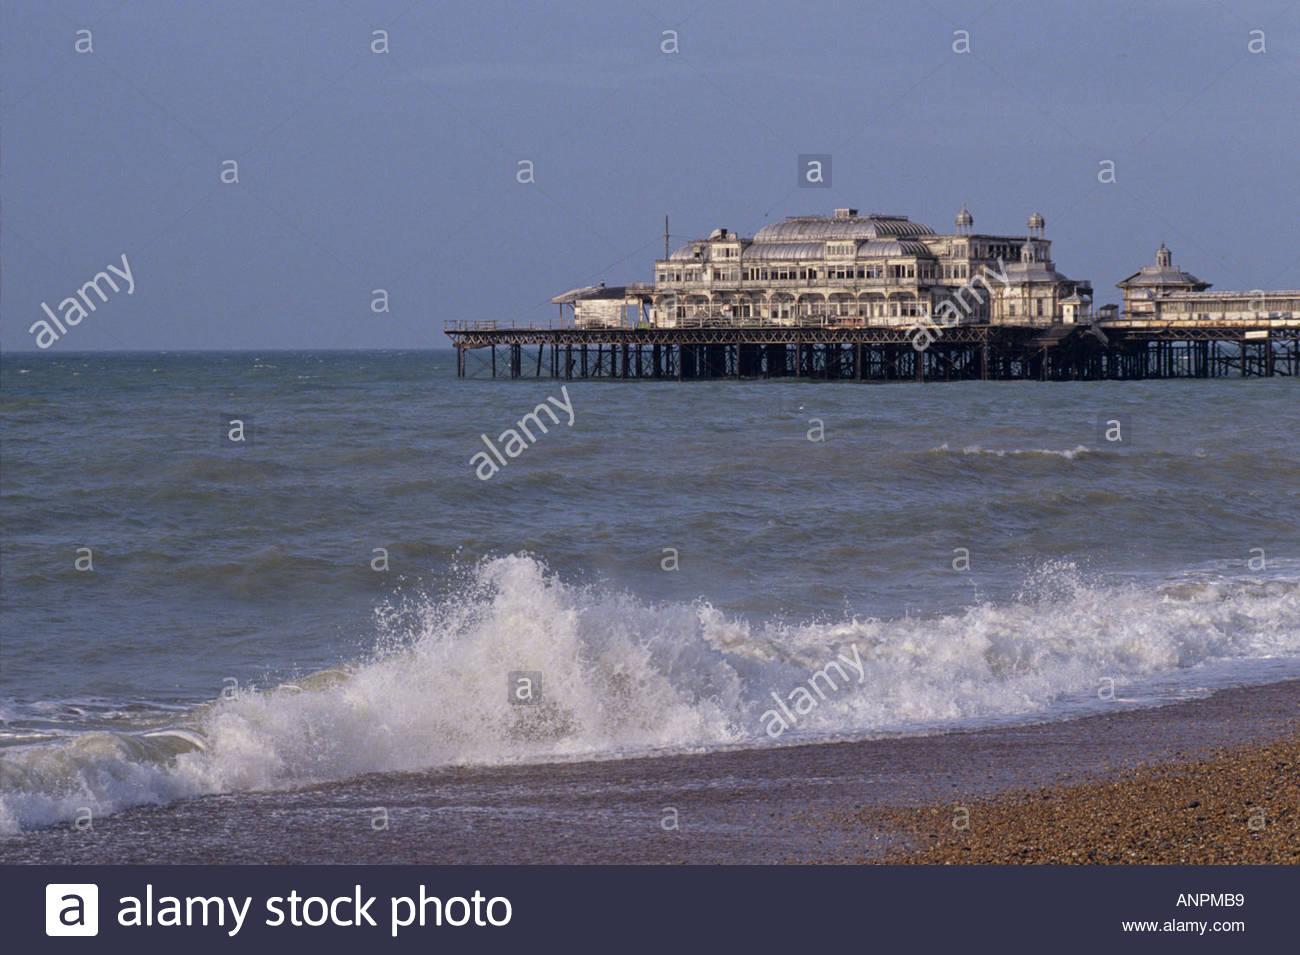 The derelict West Pier, Brighton, Sussex, England in 1991 Stock Photo